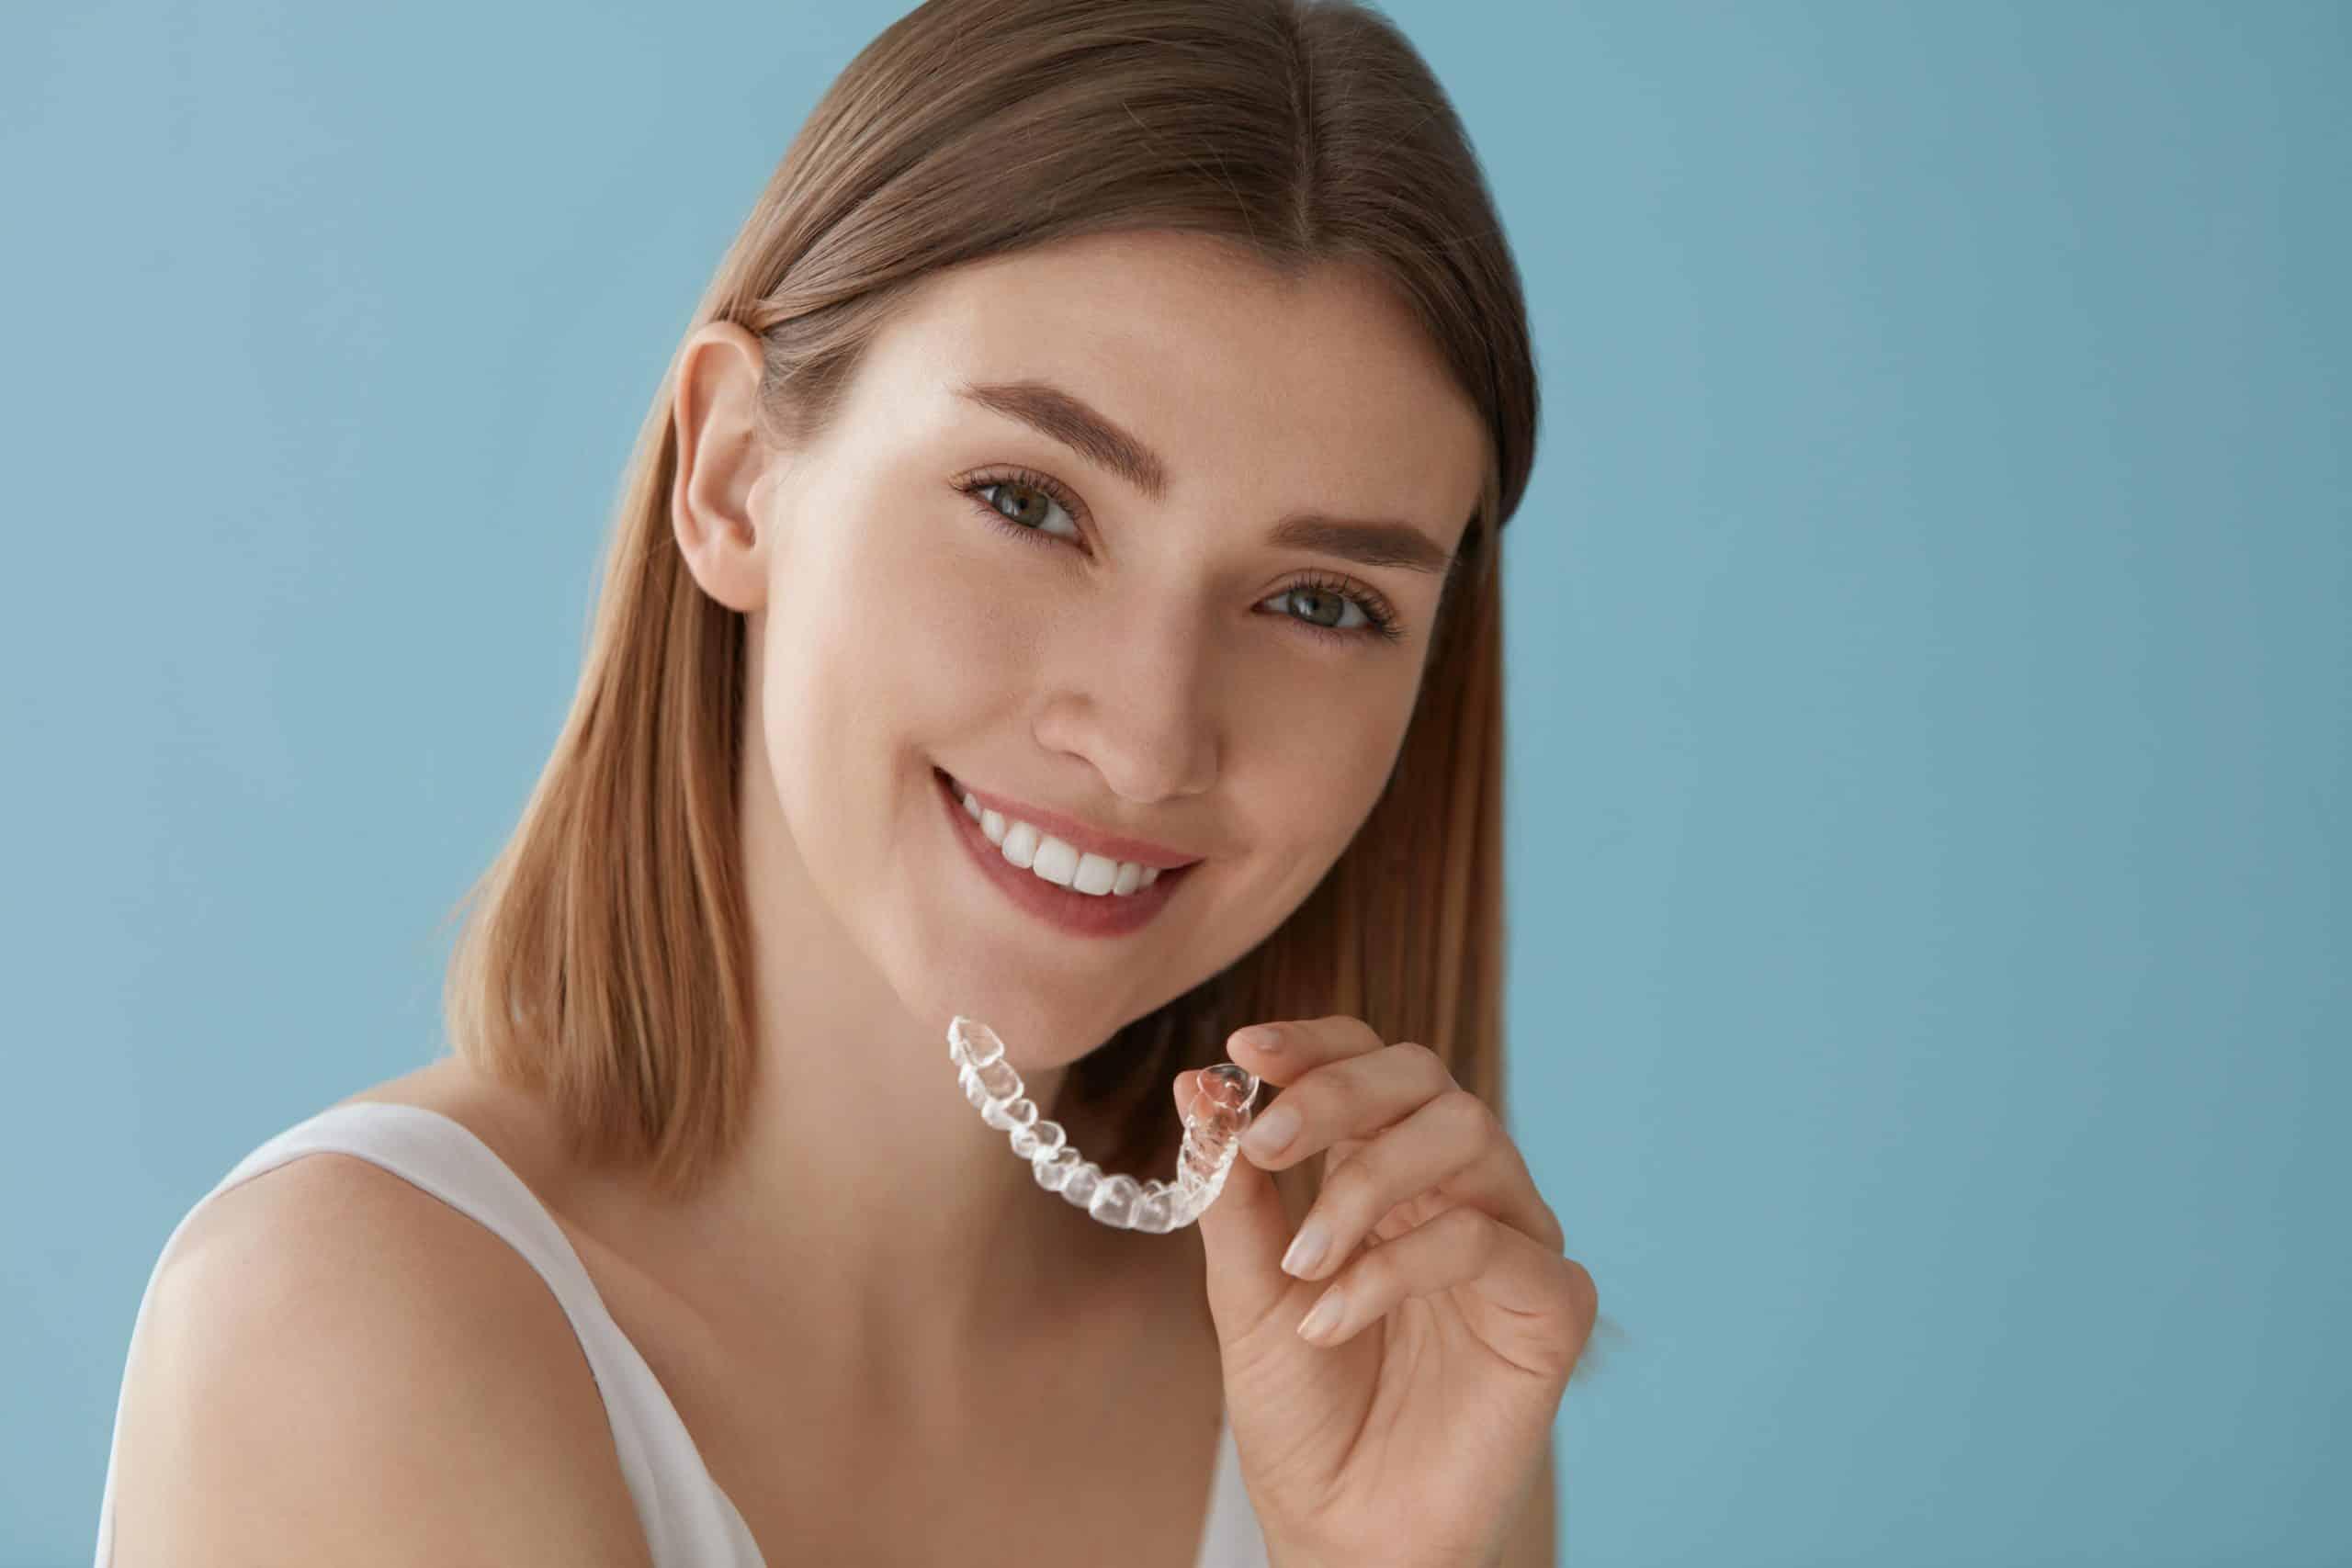 Sunbird Ortho - Teeth,Whitening.,Woman,With,White,Smile,,Healthy,Straight,Teeth,Using